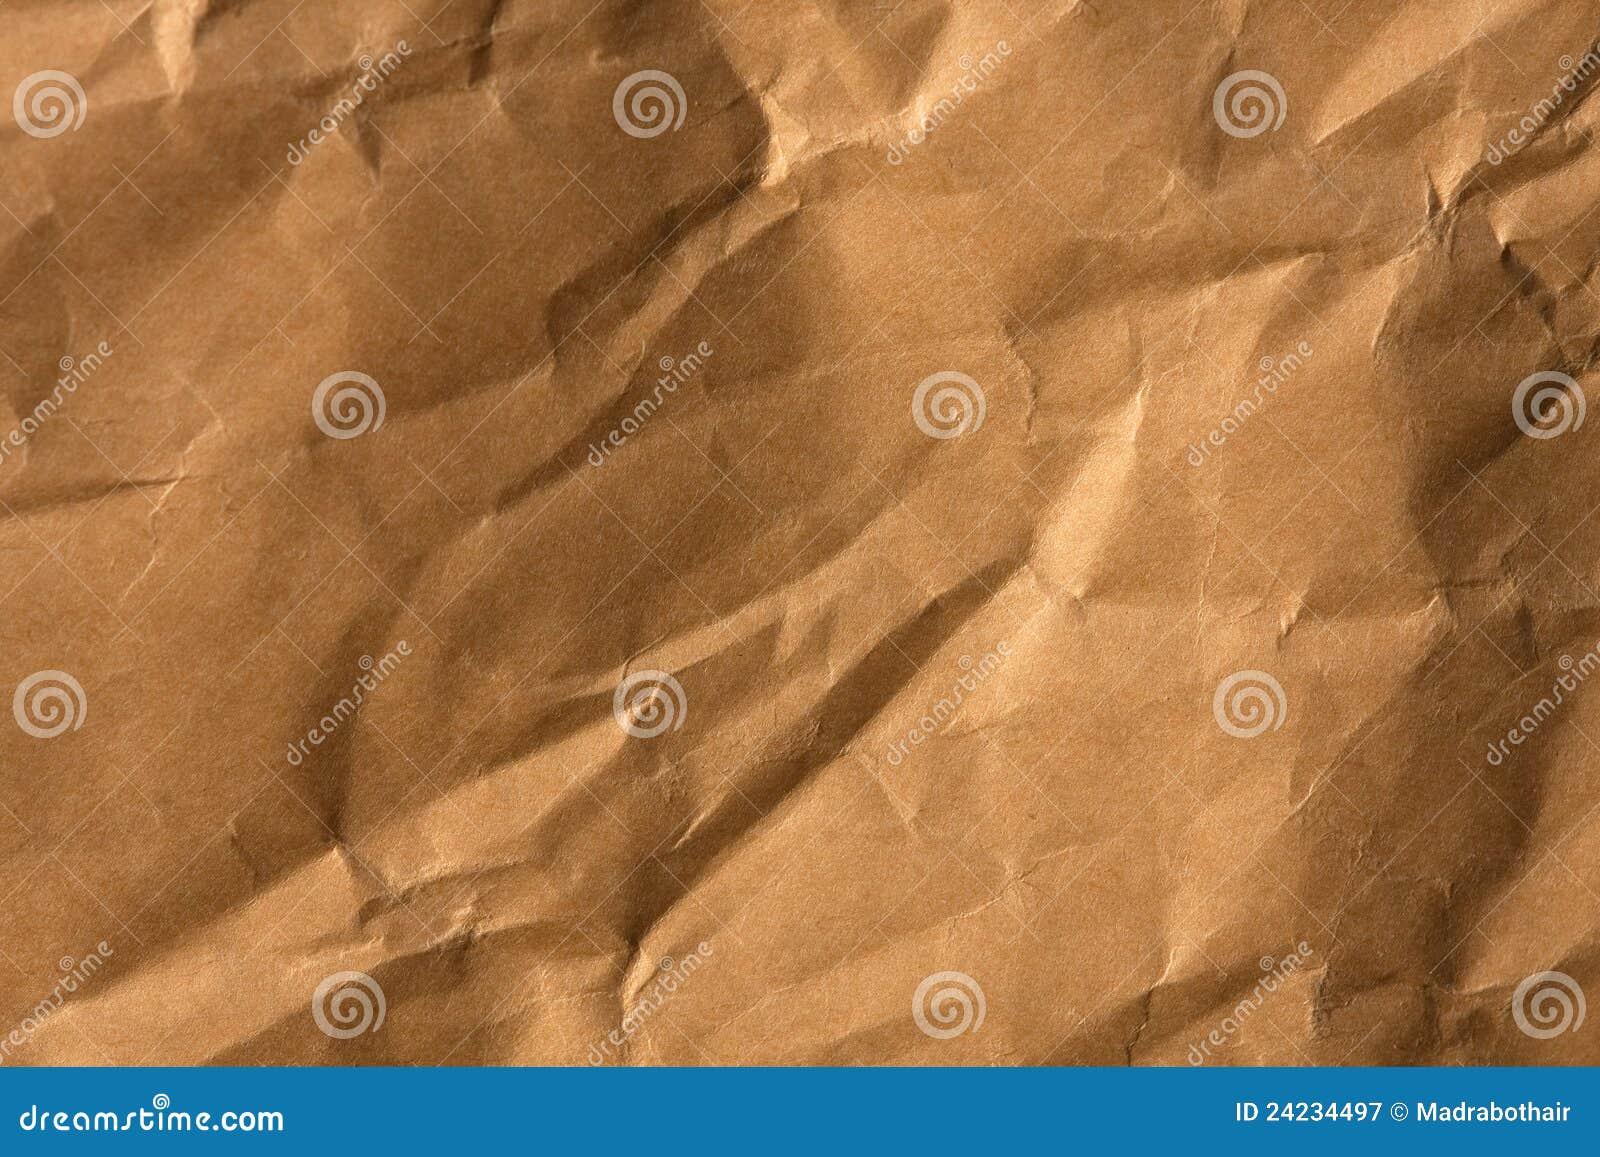 Crinkled brown paper texture